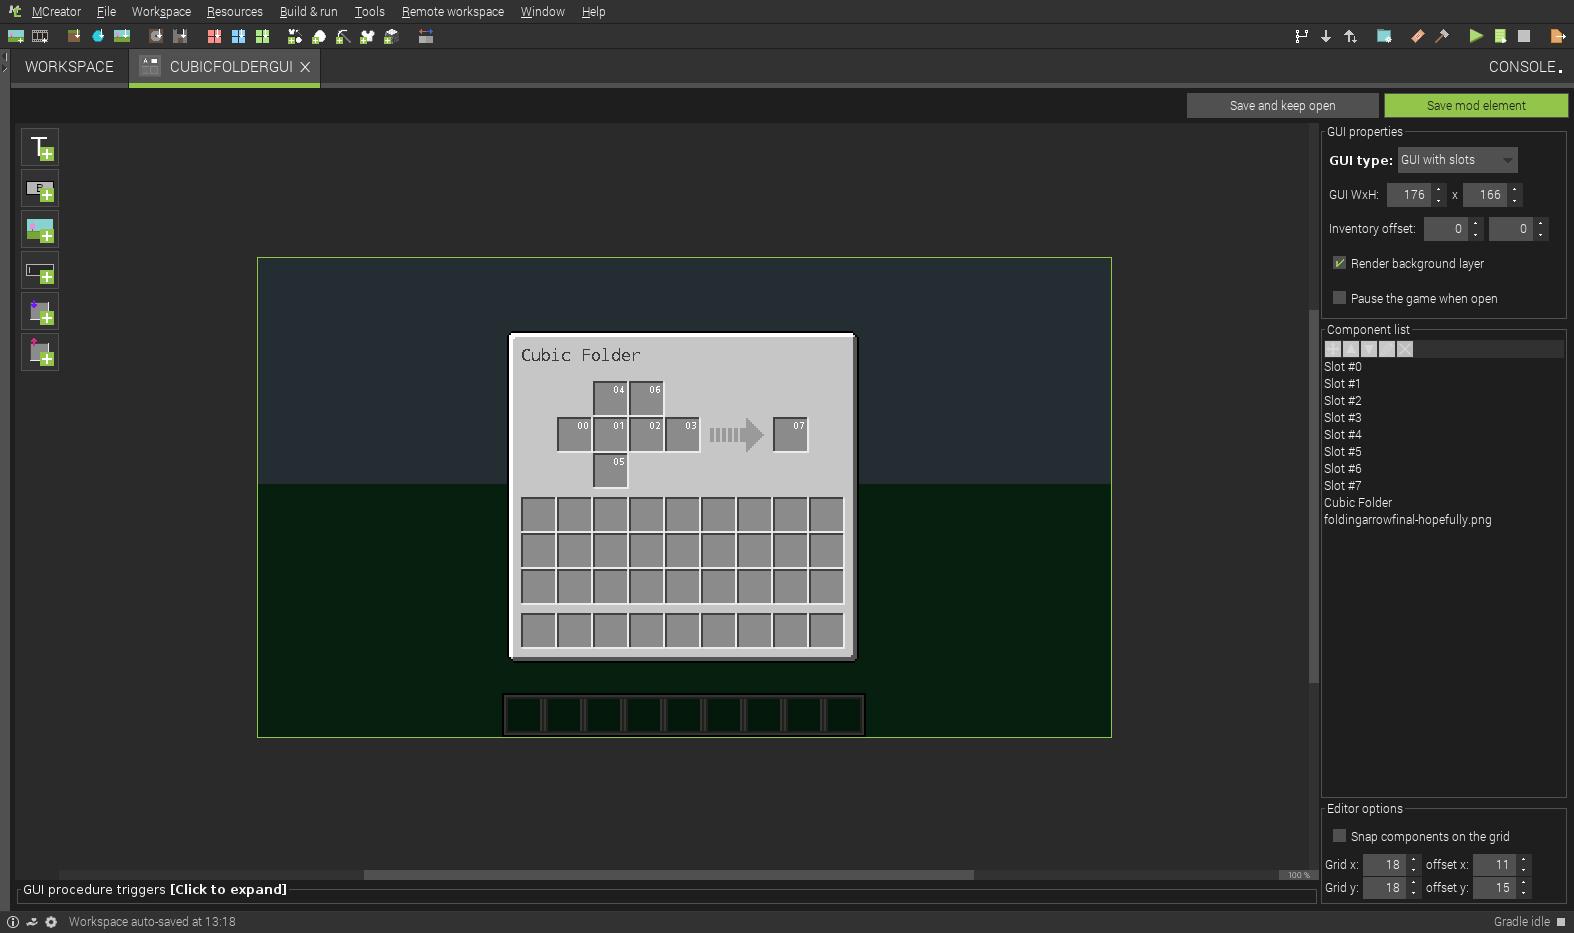 Cubic Folder GUI